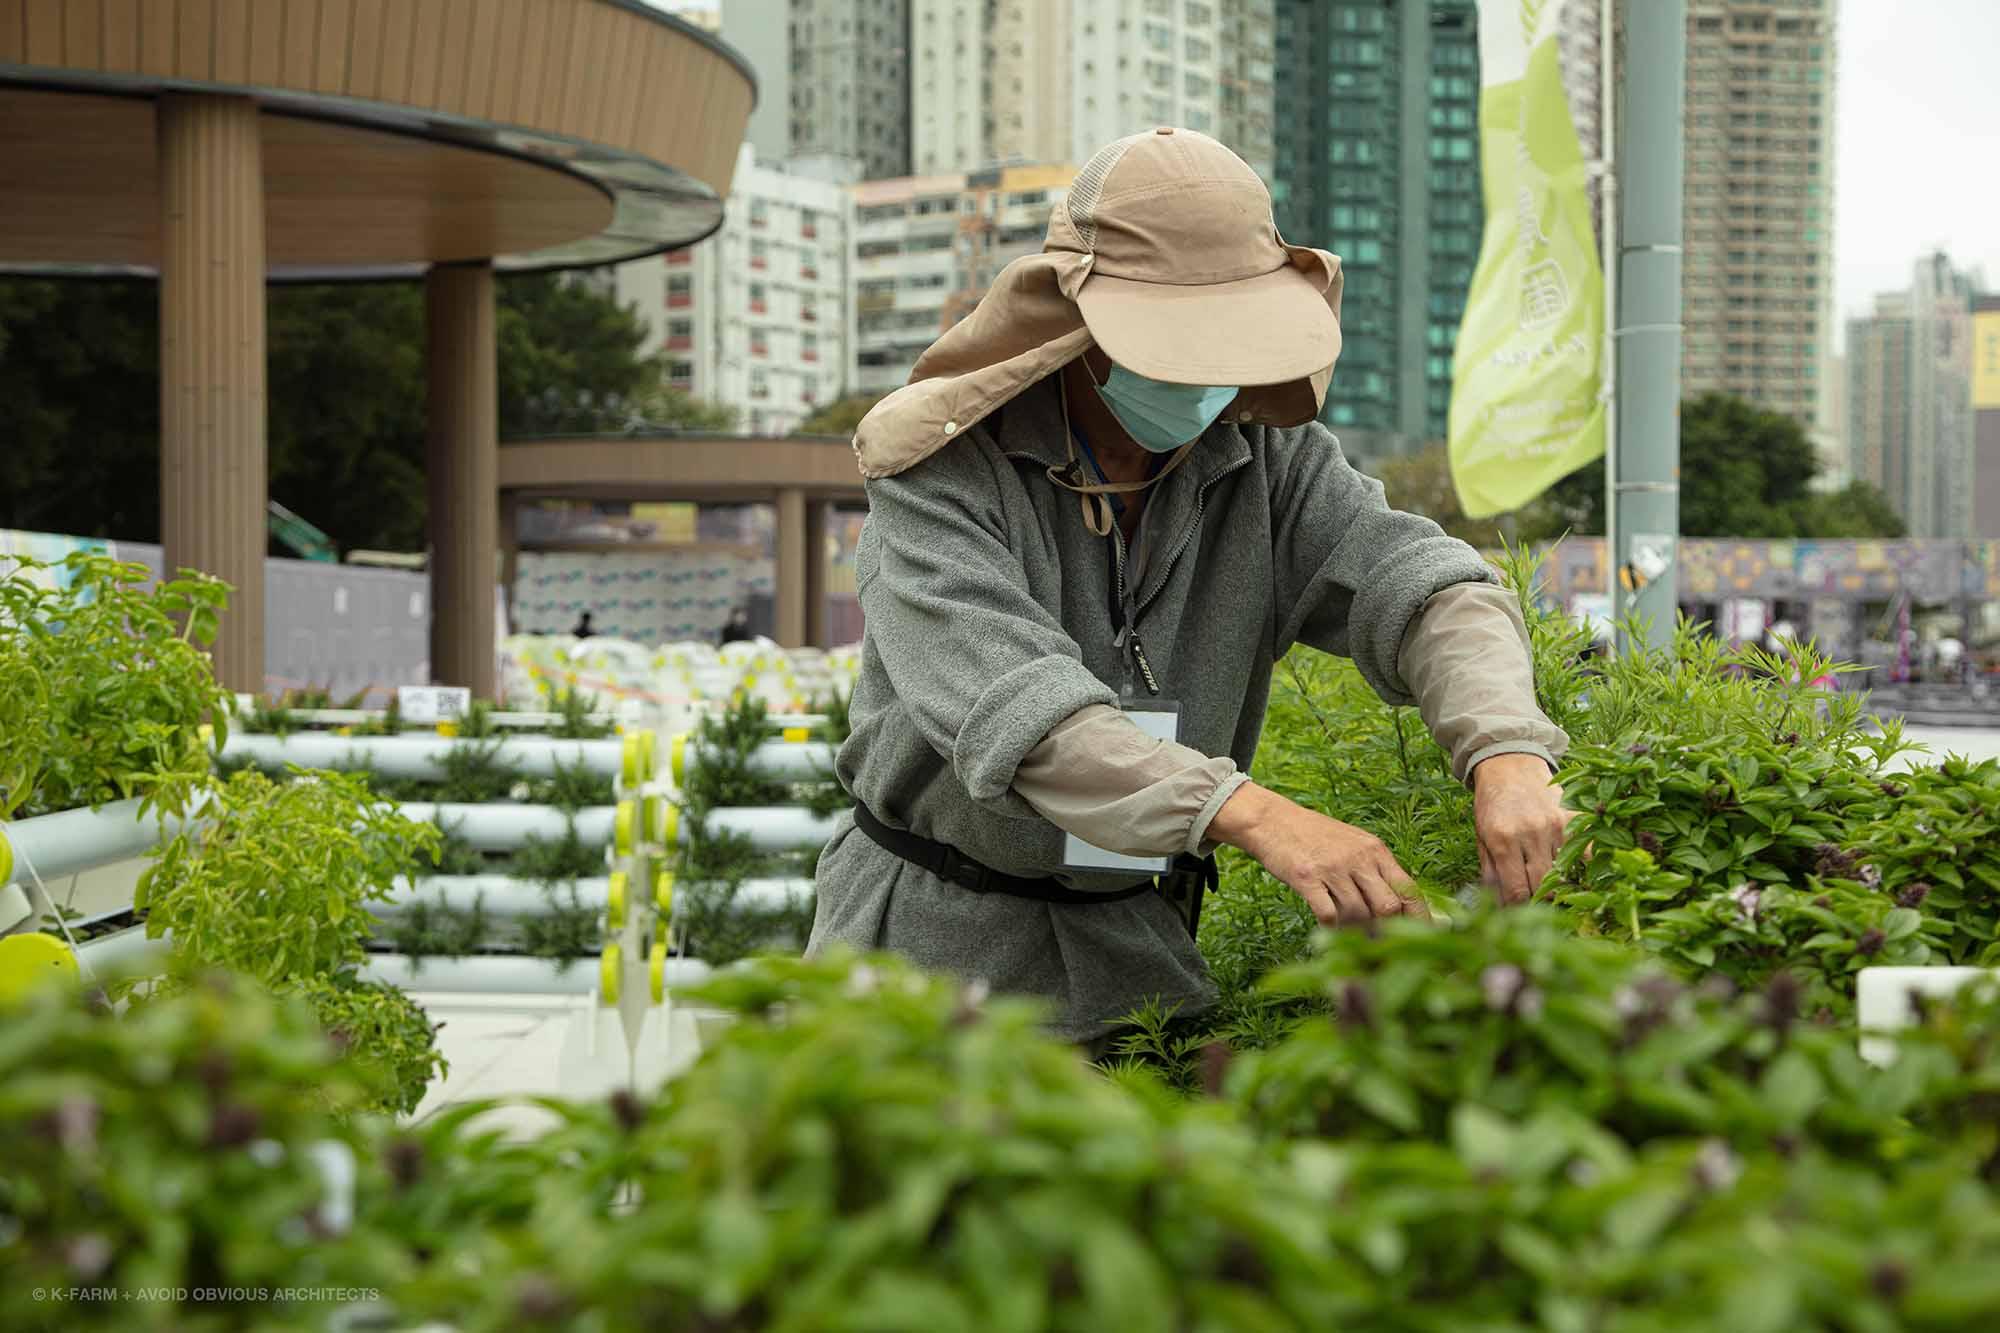 urban farm, k-farm, smart farm, aoa, avoid obvious, architects, sustainable, landscape, urban planning, vicky chan, architect, designer, green design, green building, happy city